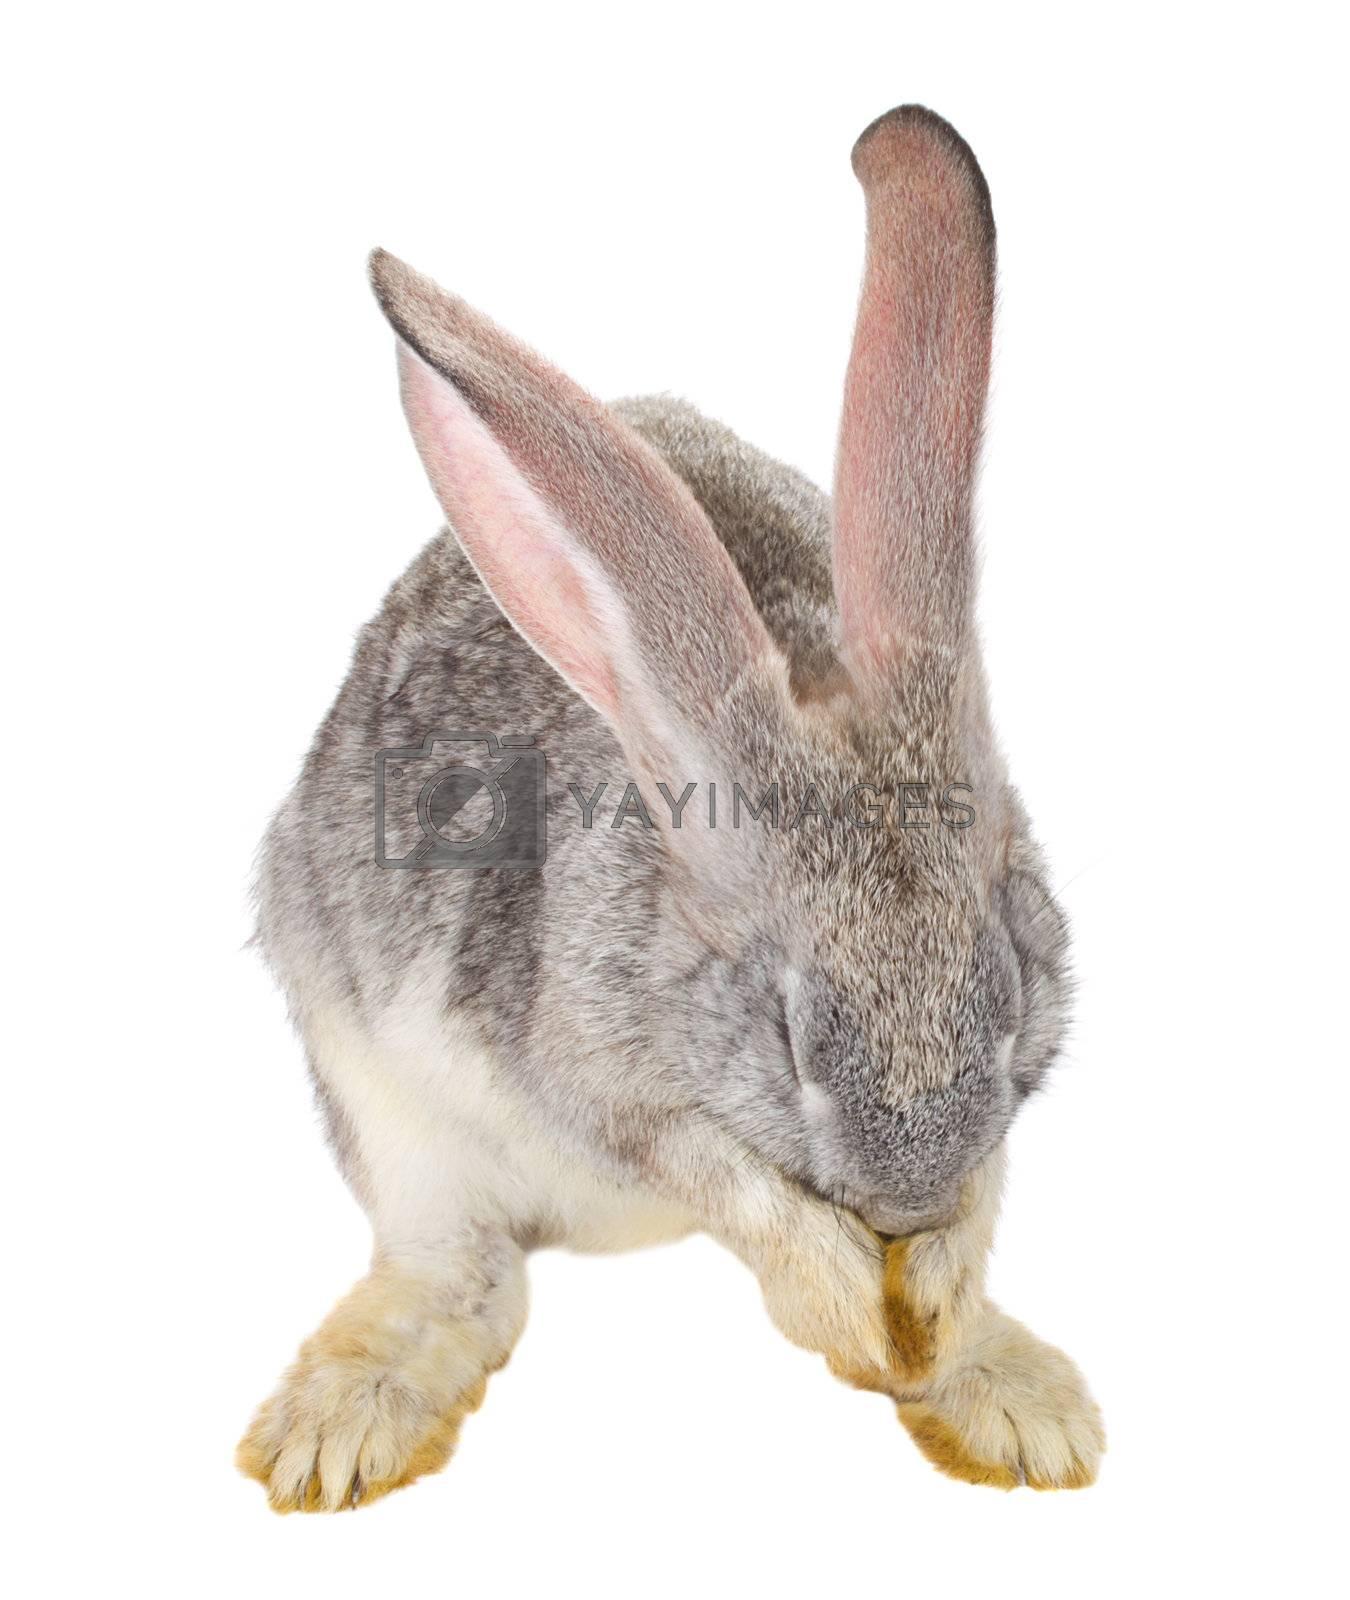 rabbit hiding his muzzle, isolated on white